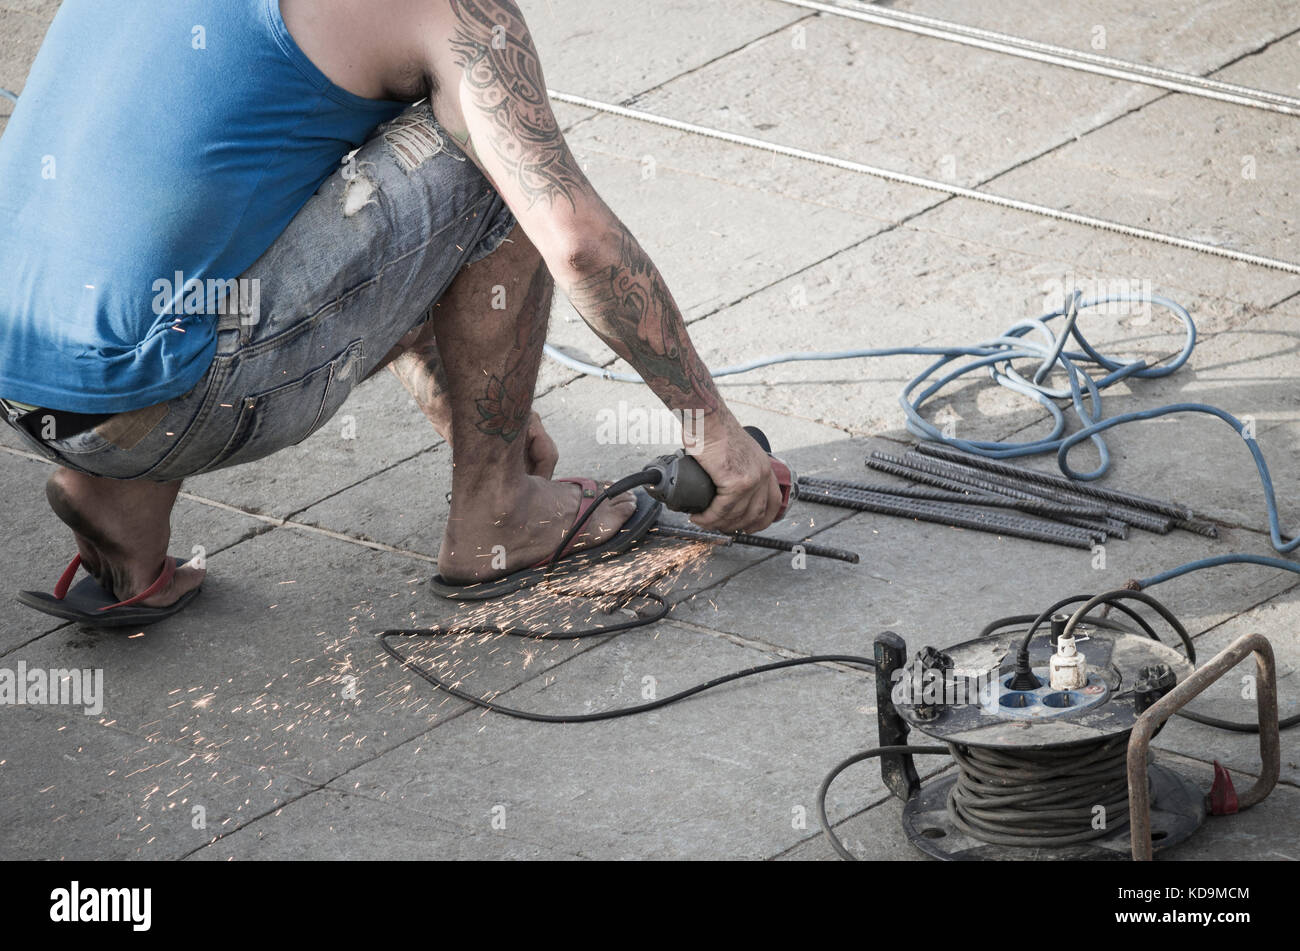 7c3448622 Man in Spain welding and grinding outdoors wearing flip flops Stock ...